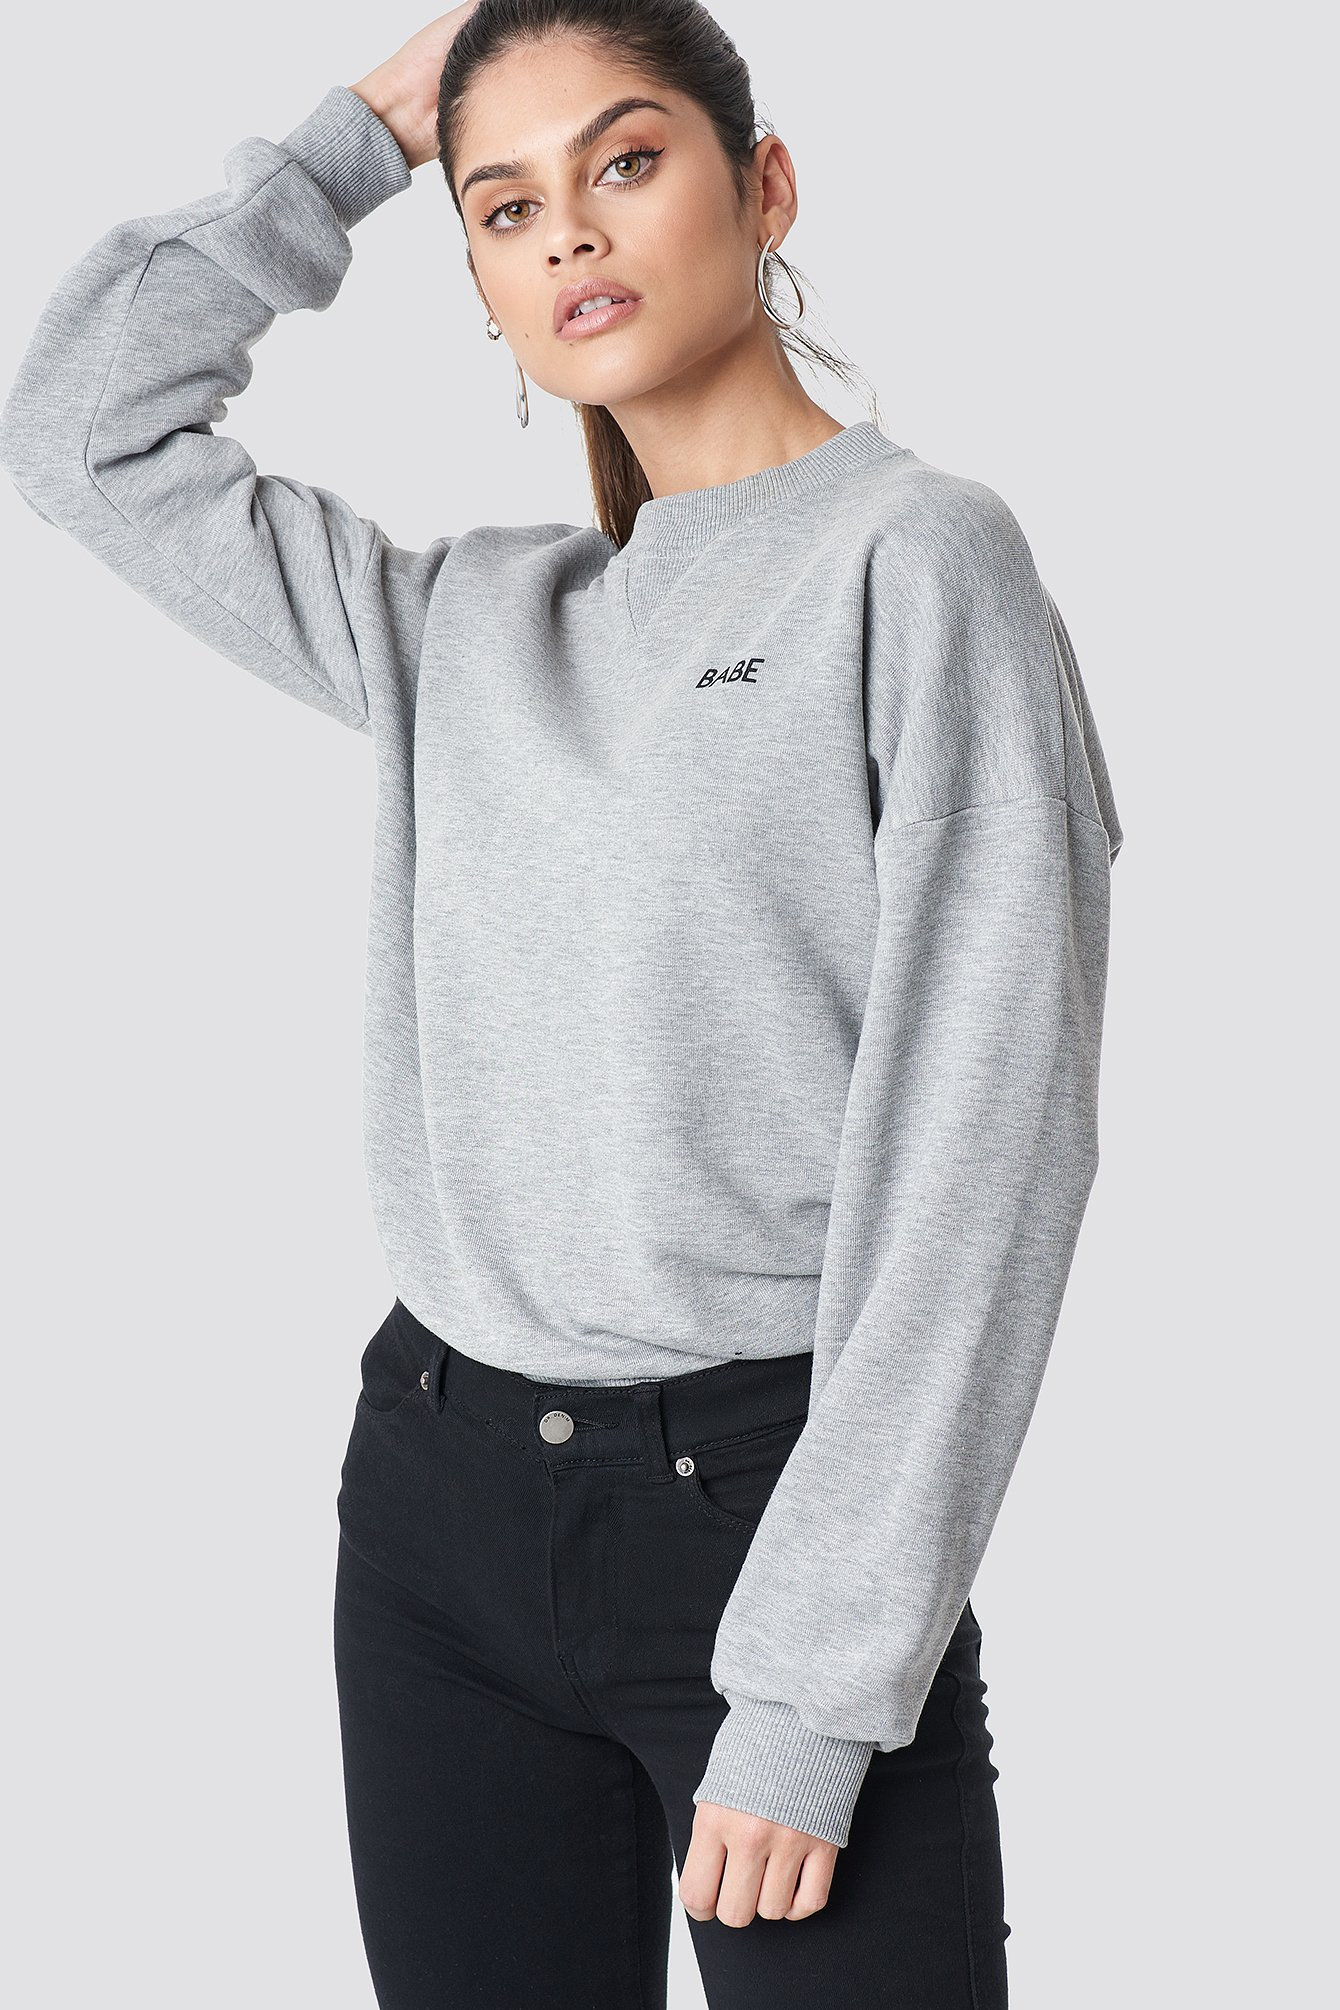 na-kd -  Babe Sweatshirt - Grey